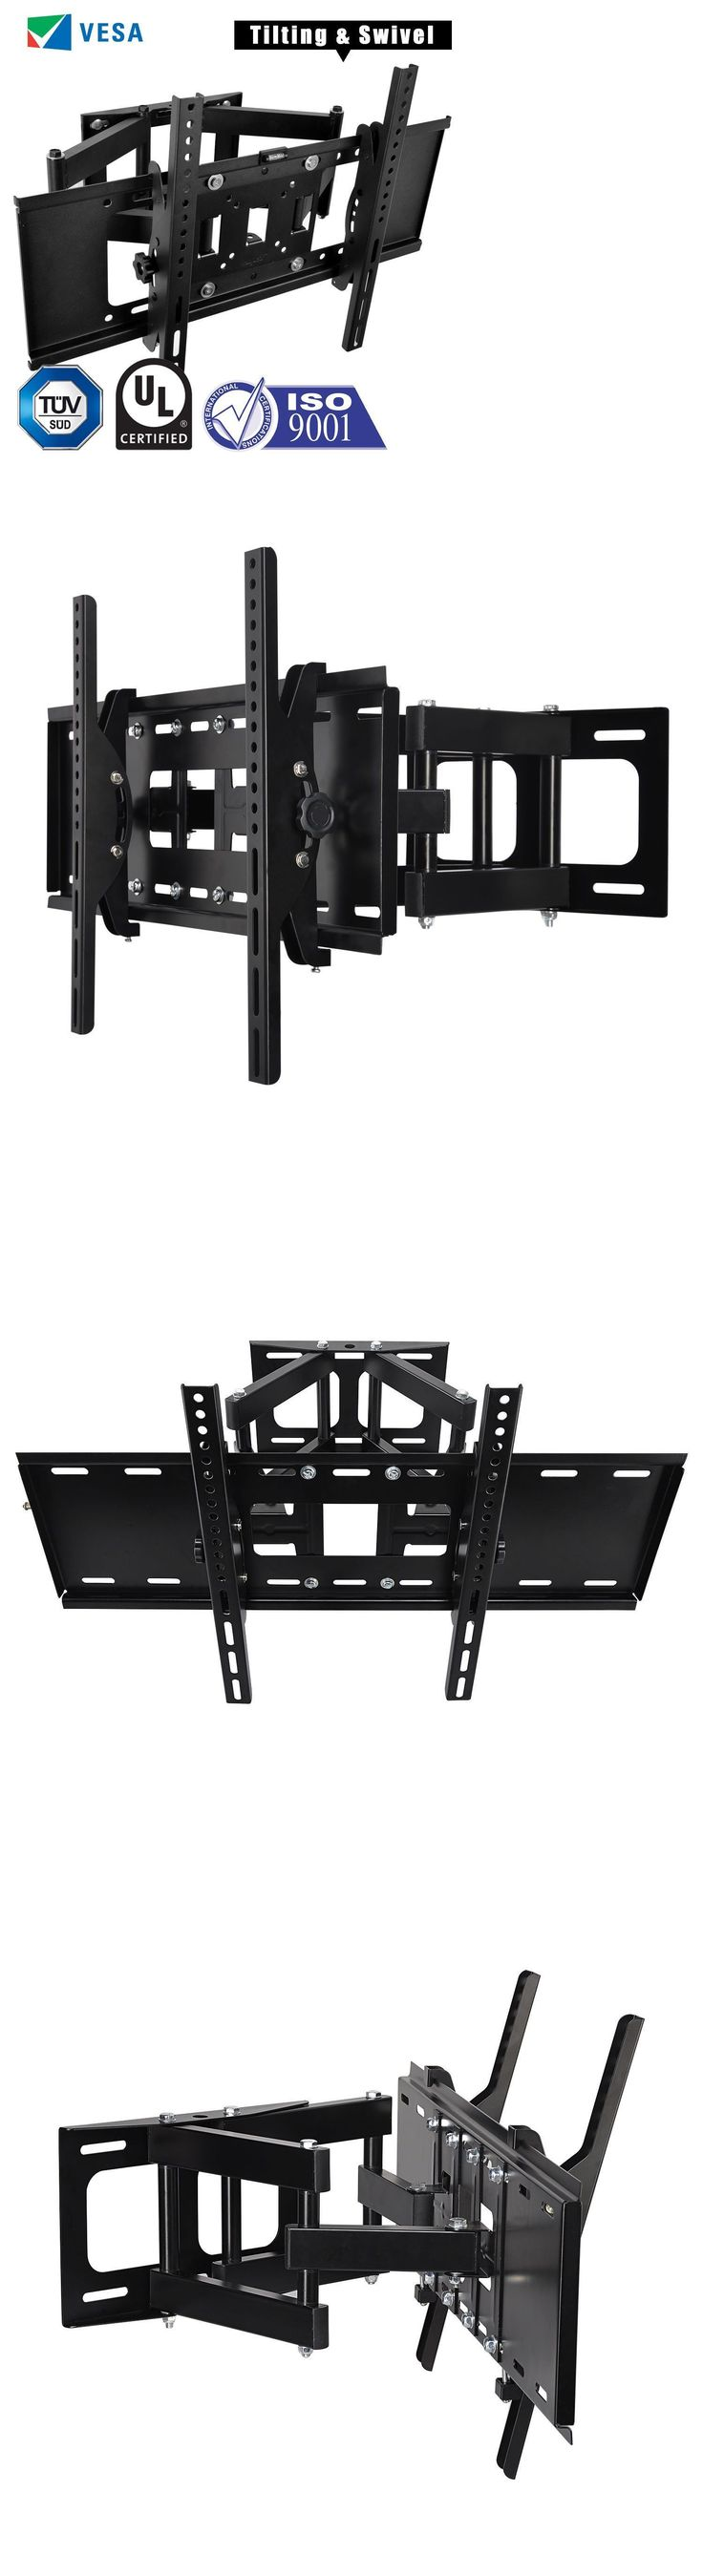 TV Mounts and Brackets: Articulating Swivel Tilt Full Motion Tv Wall Mount Bracket 32 42 50 55 60 65 70 -> BUY IT NOW ONLY: $30.99 on eBay!